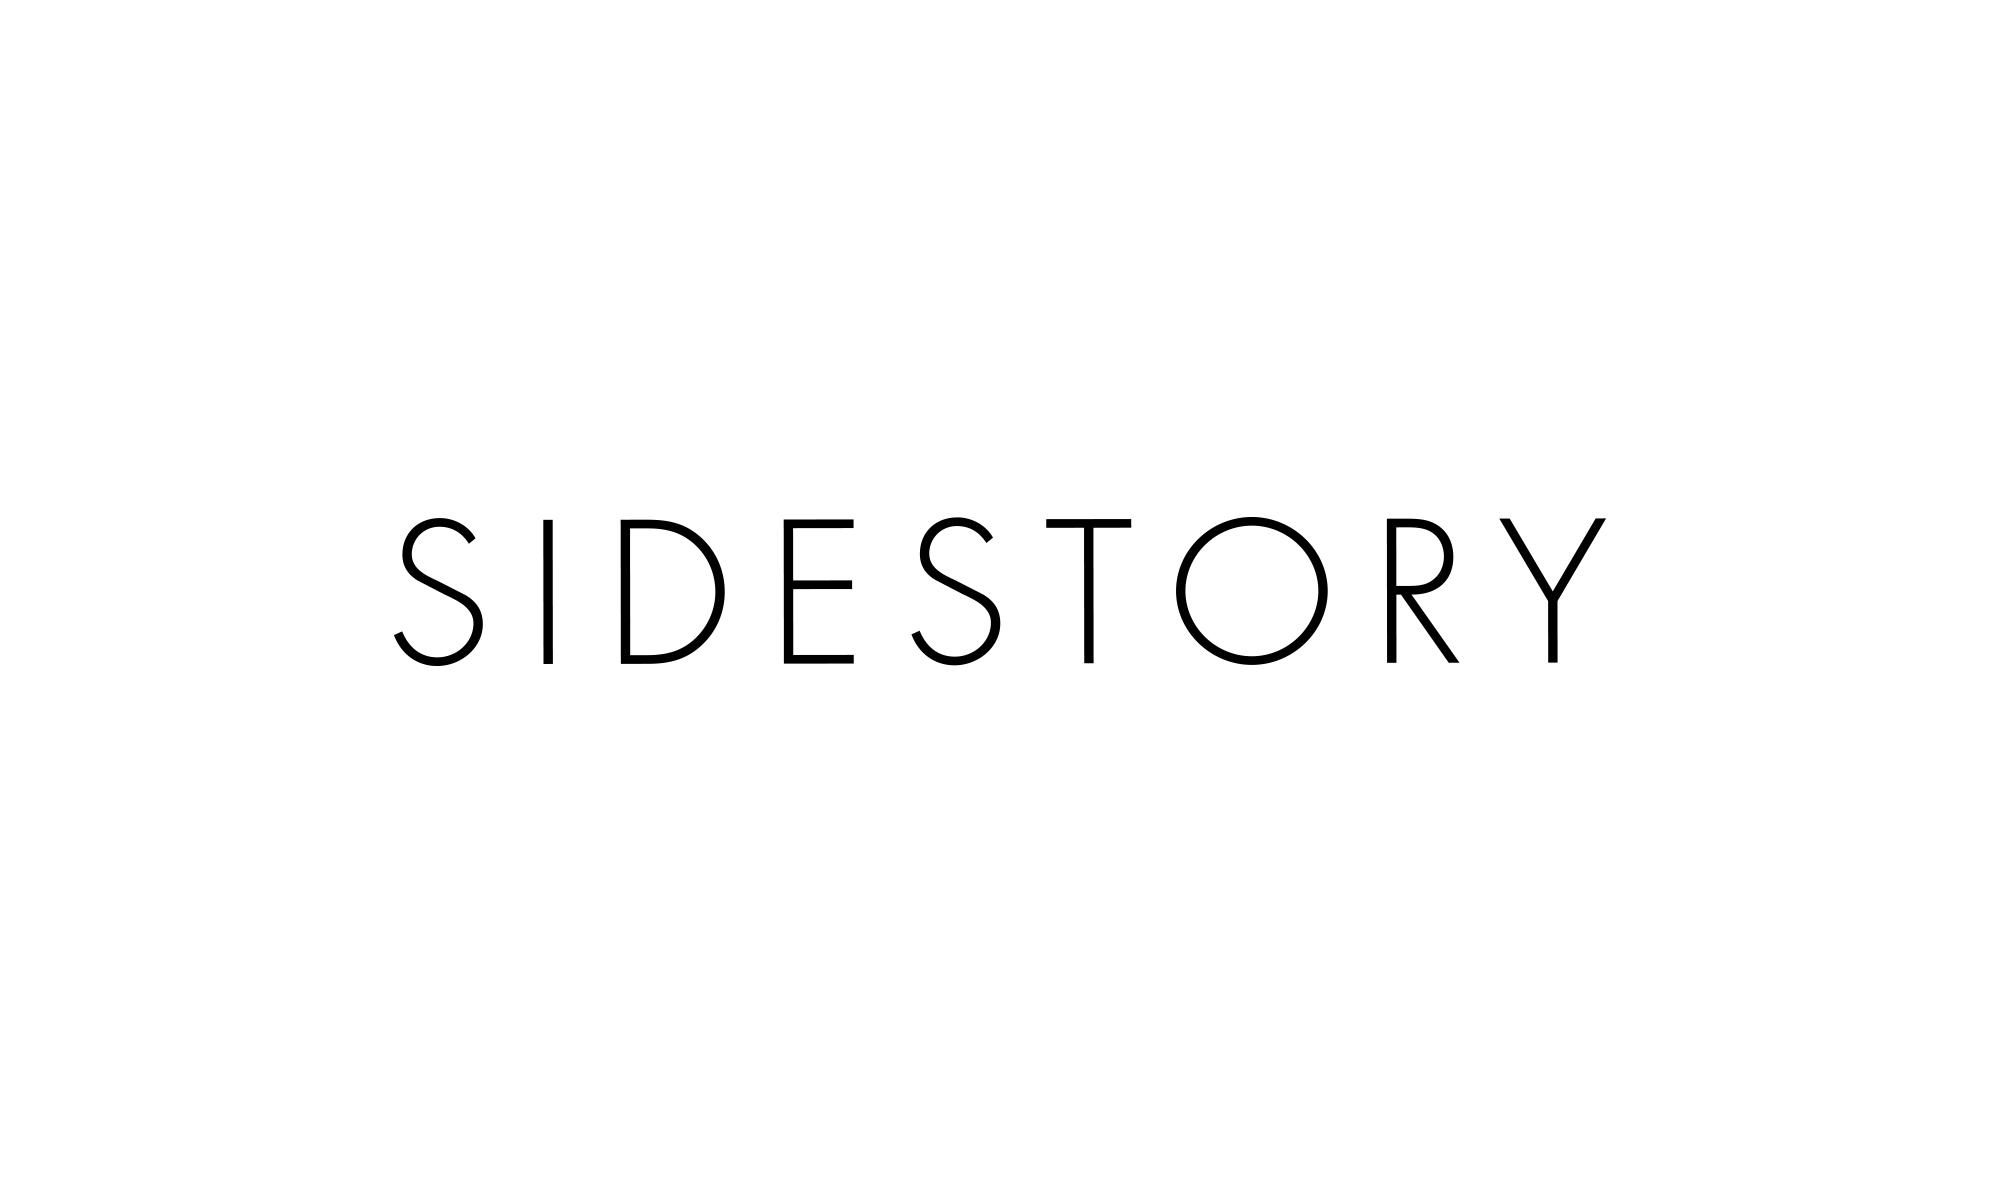 sidestory-logo.png